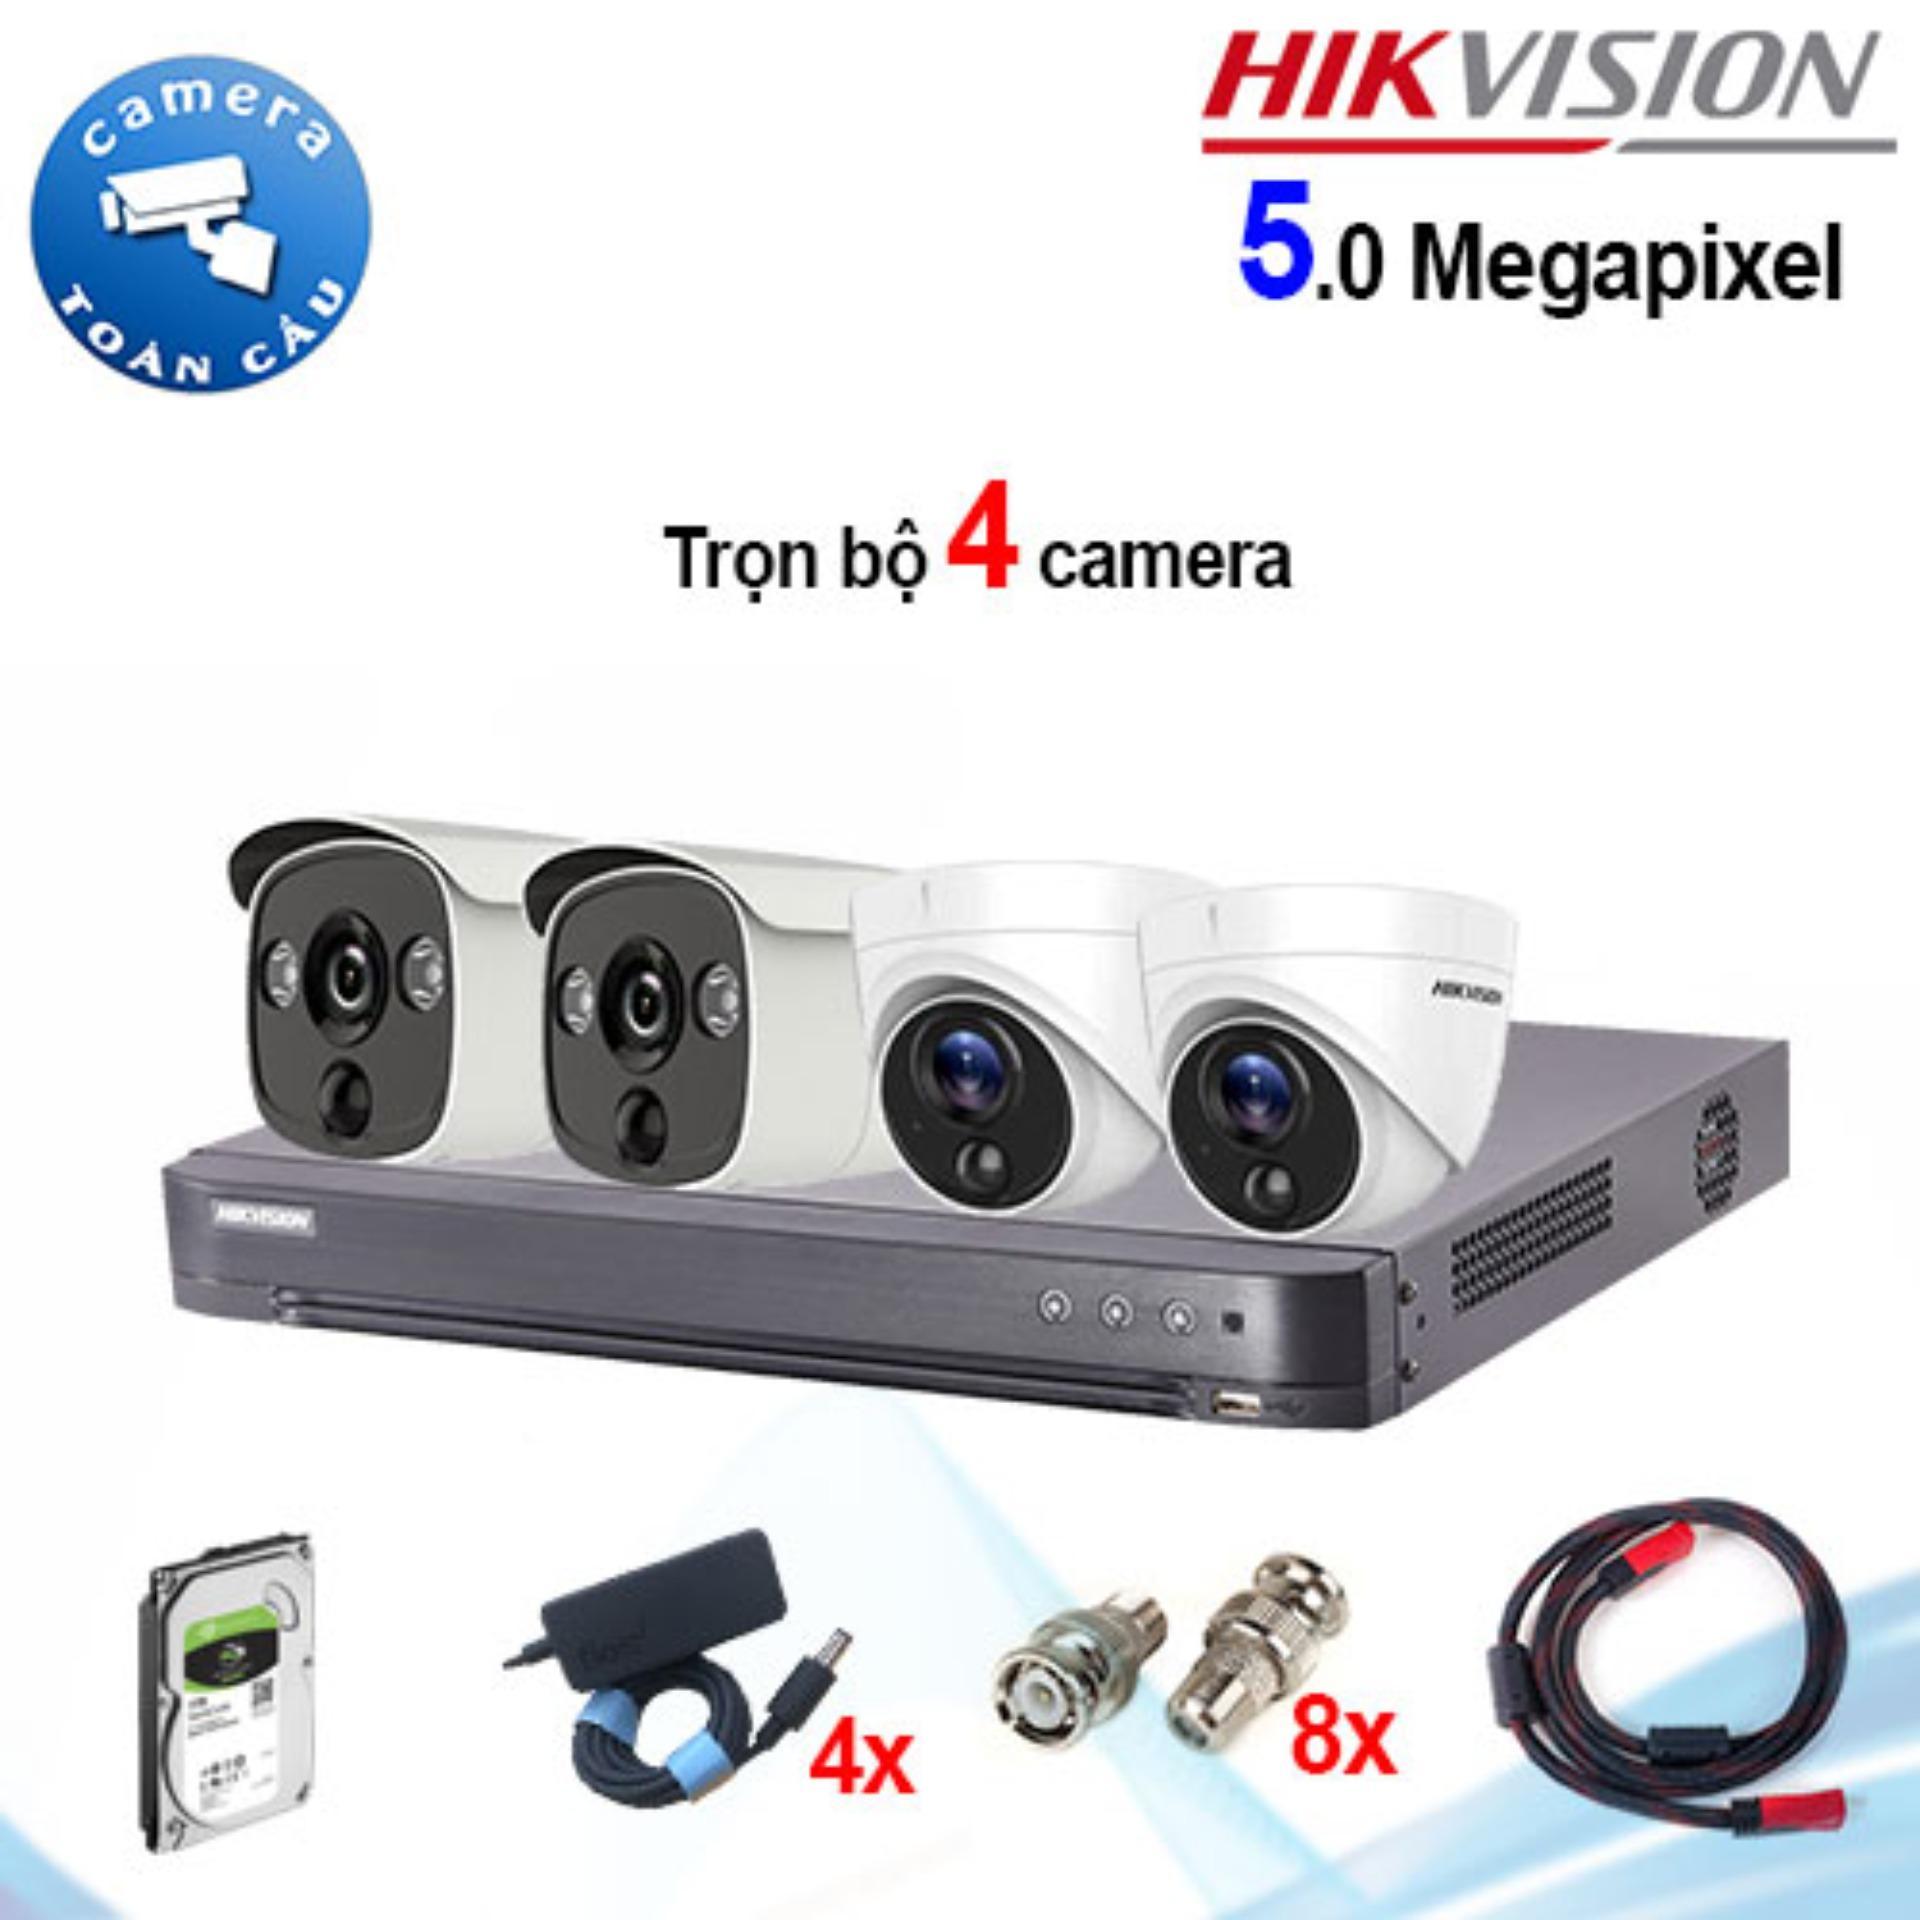 Trọn bộ 4 camera Hikvision DS-2CE12H0T-PIRL (5MP) + DS-2CE71H0T-PIRL (5MP) + đầu ghi 4 kênh DS-7204HUHI-K1